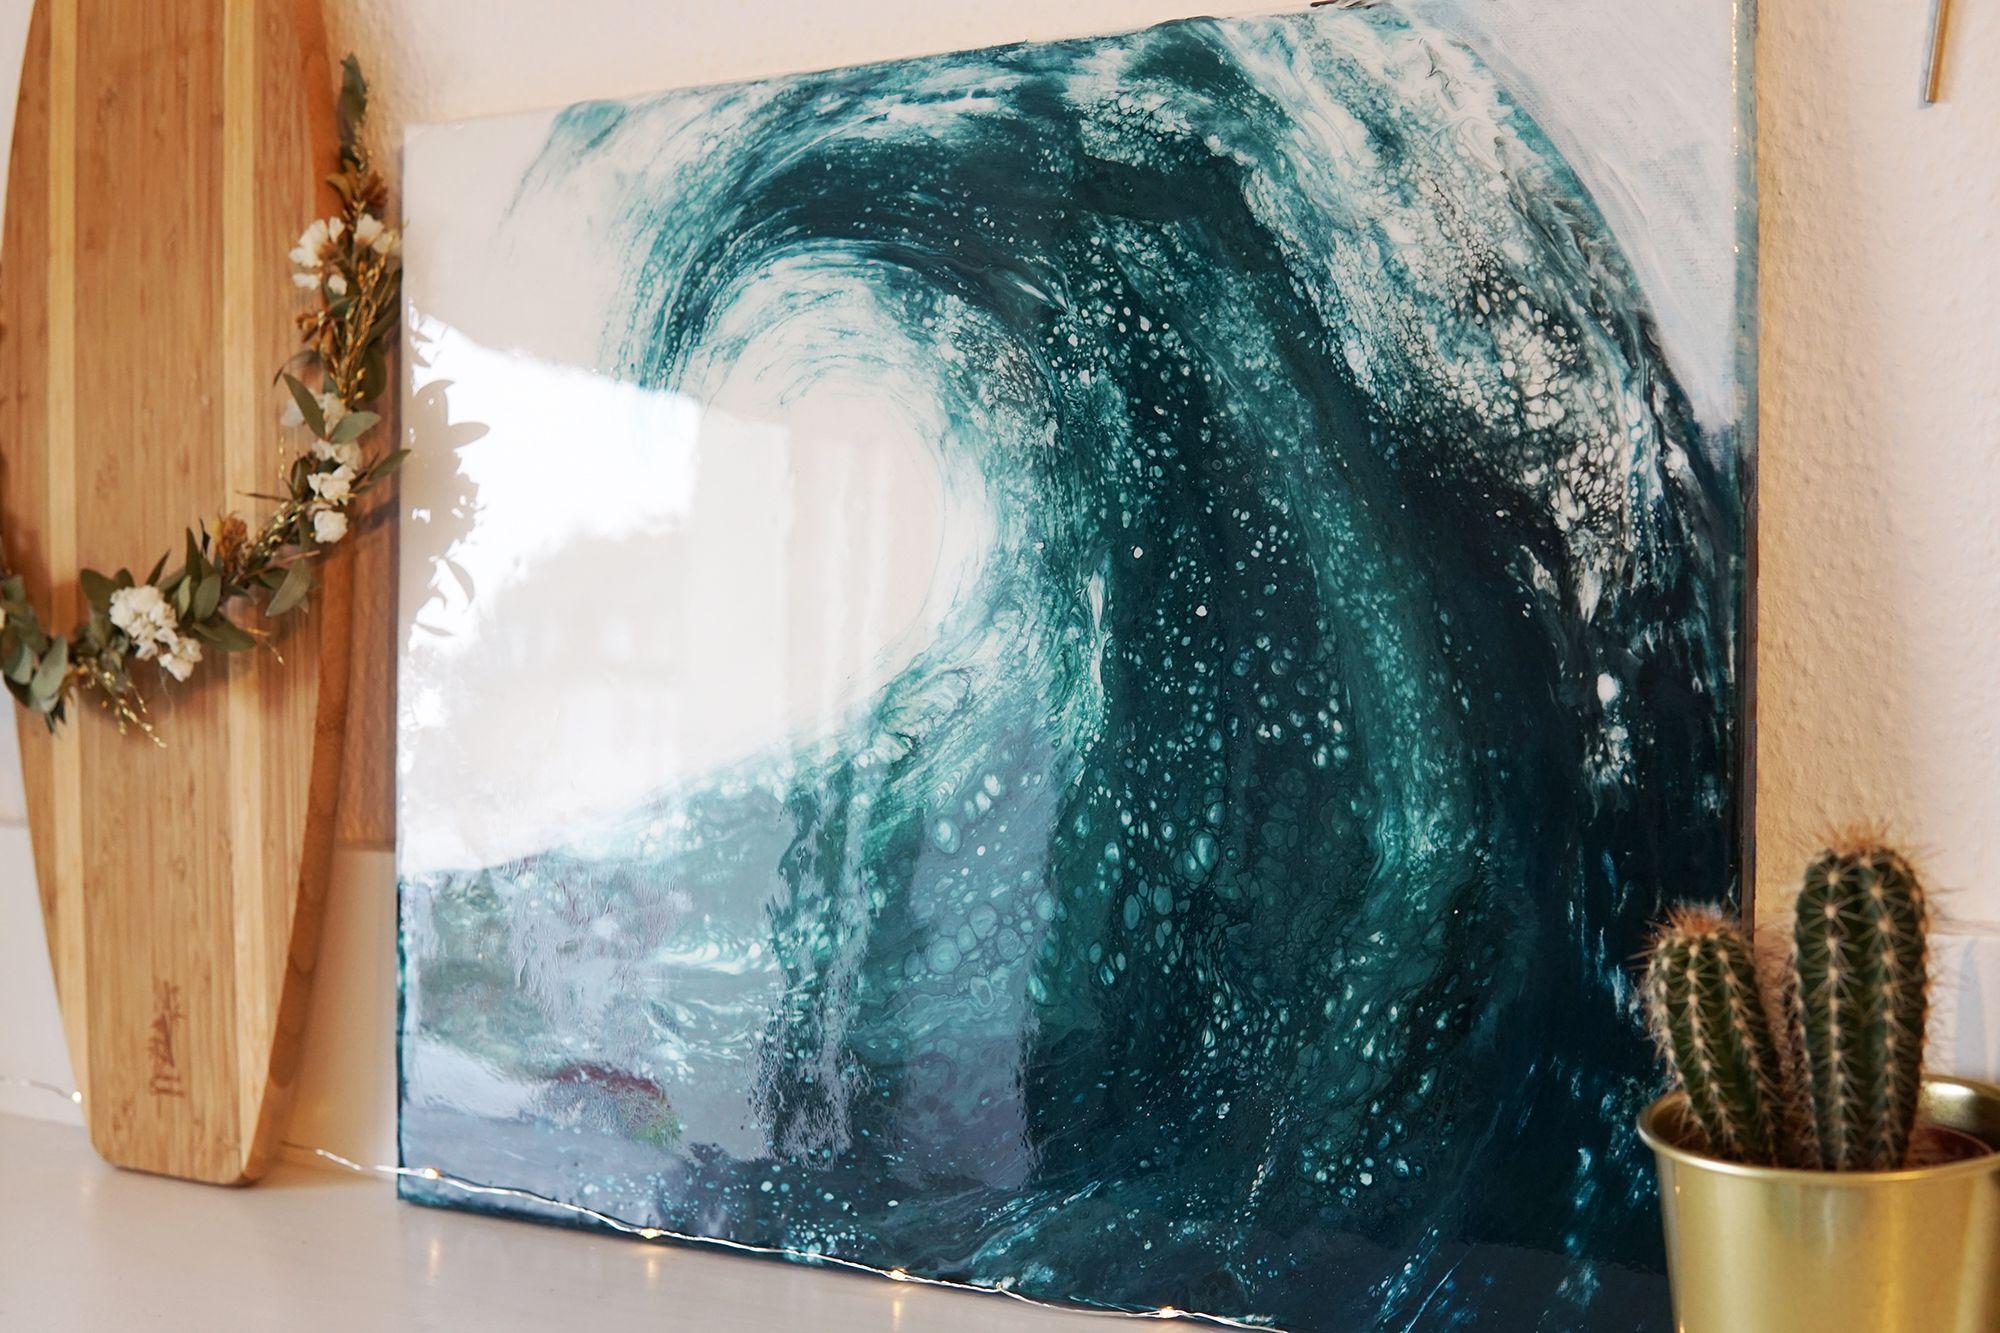 wave acrylic pouring 40 x 50 cm ocean canvas sea waves epoxy resin einzigartige kunst ozean leinwand angebote günstige fotoleinwand online bestellen